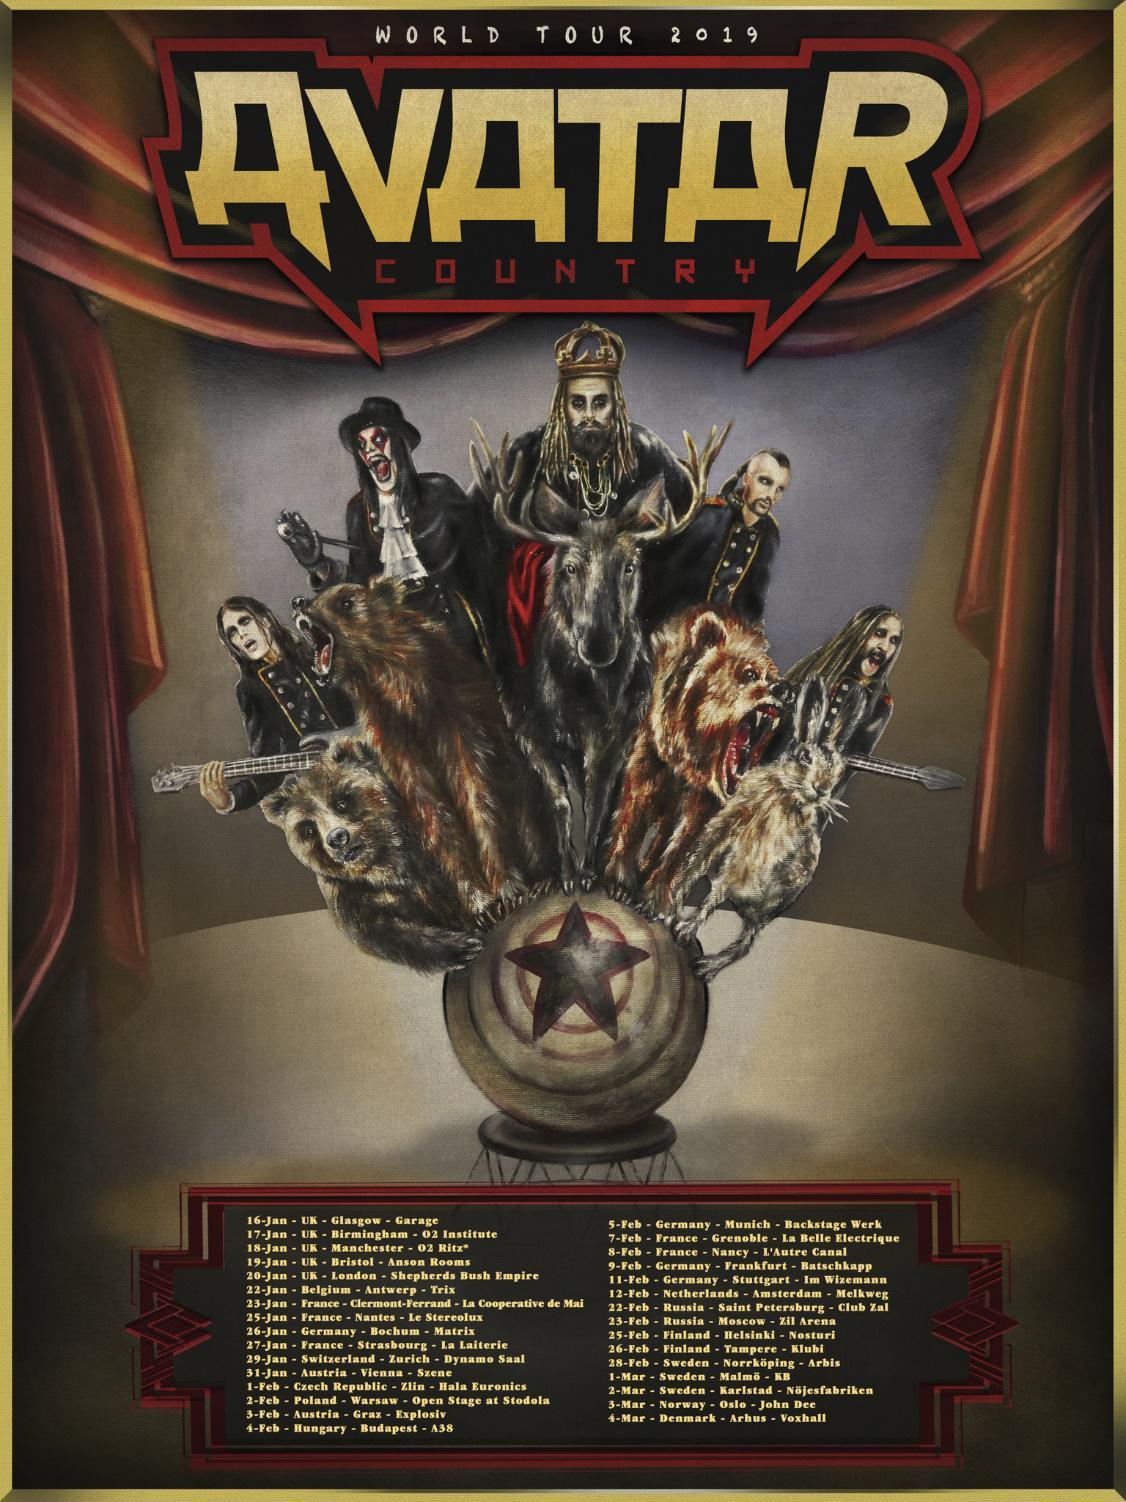 Avatar - Europe Headline Tour 2019